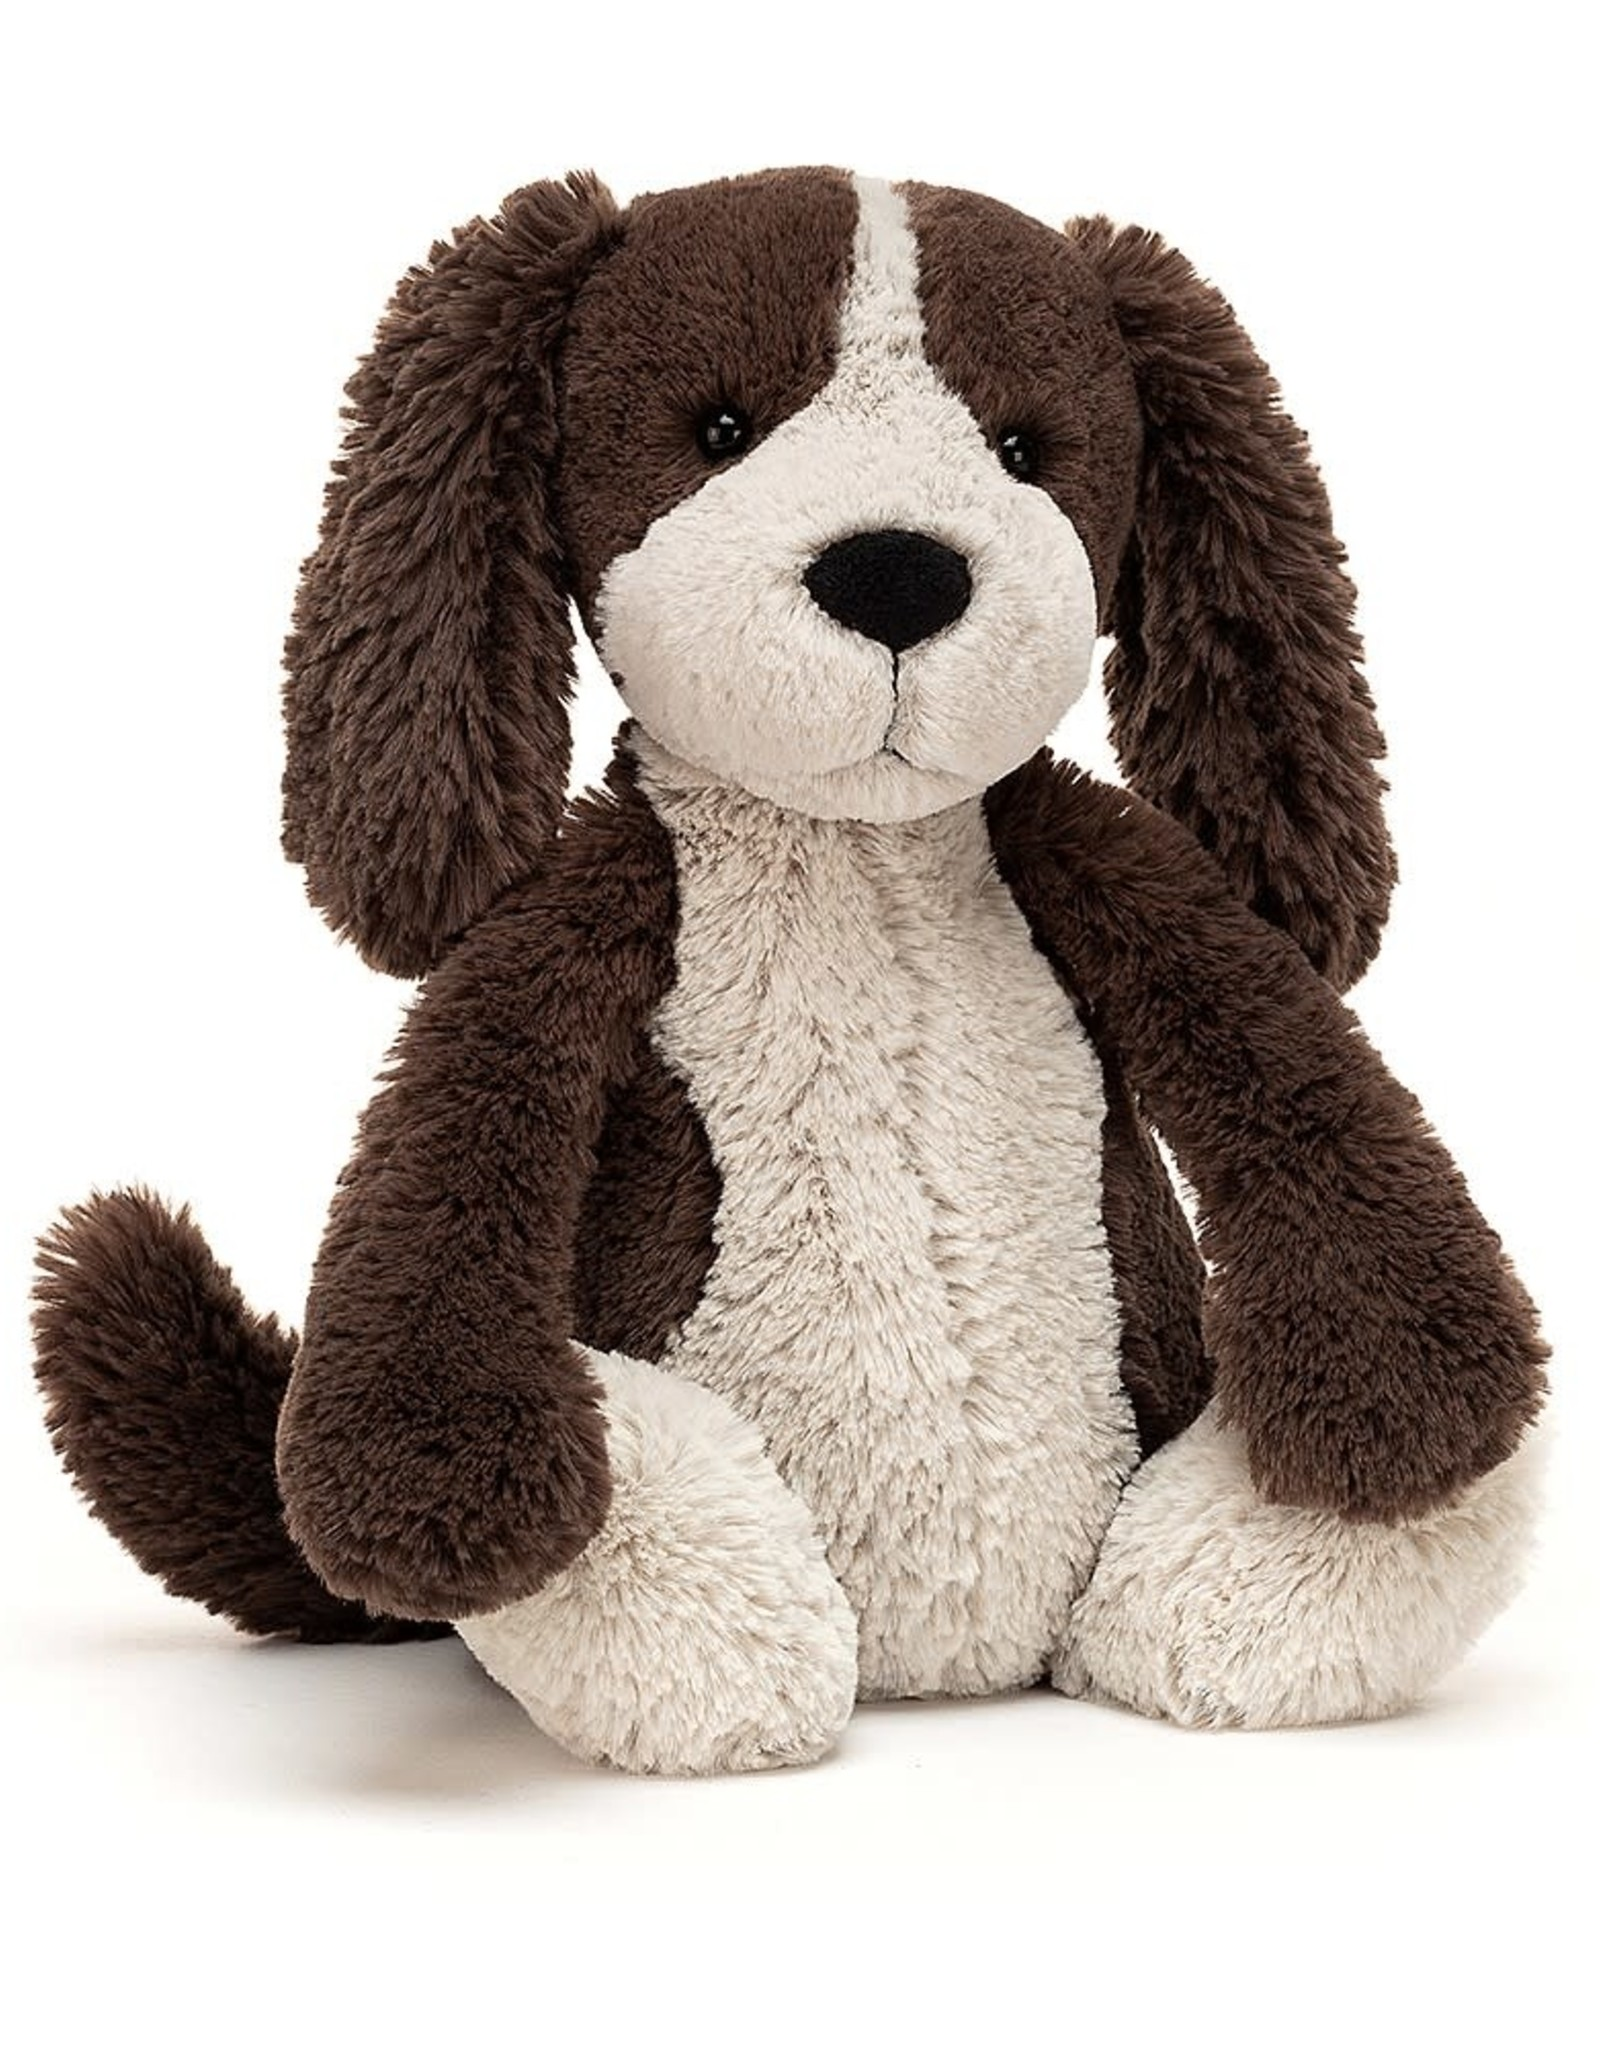 Jellycat Bashful Fudge Puppy, Medium